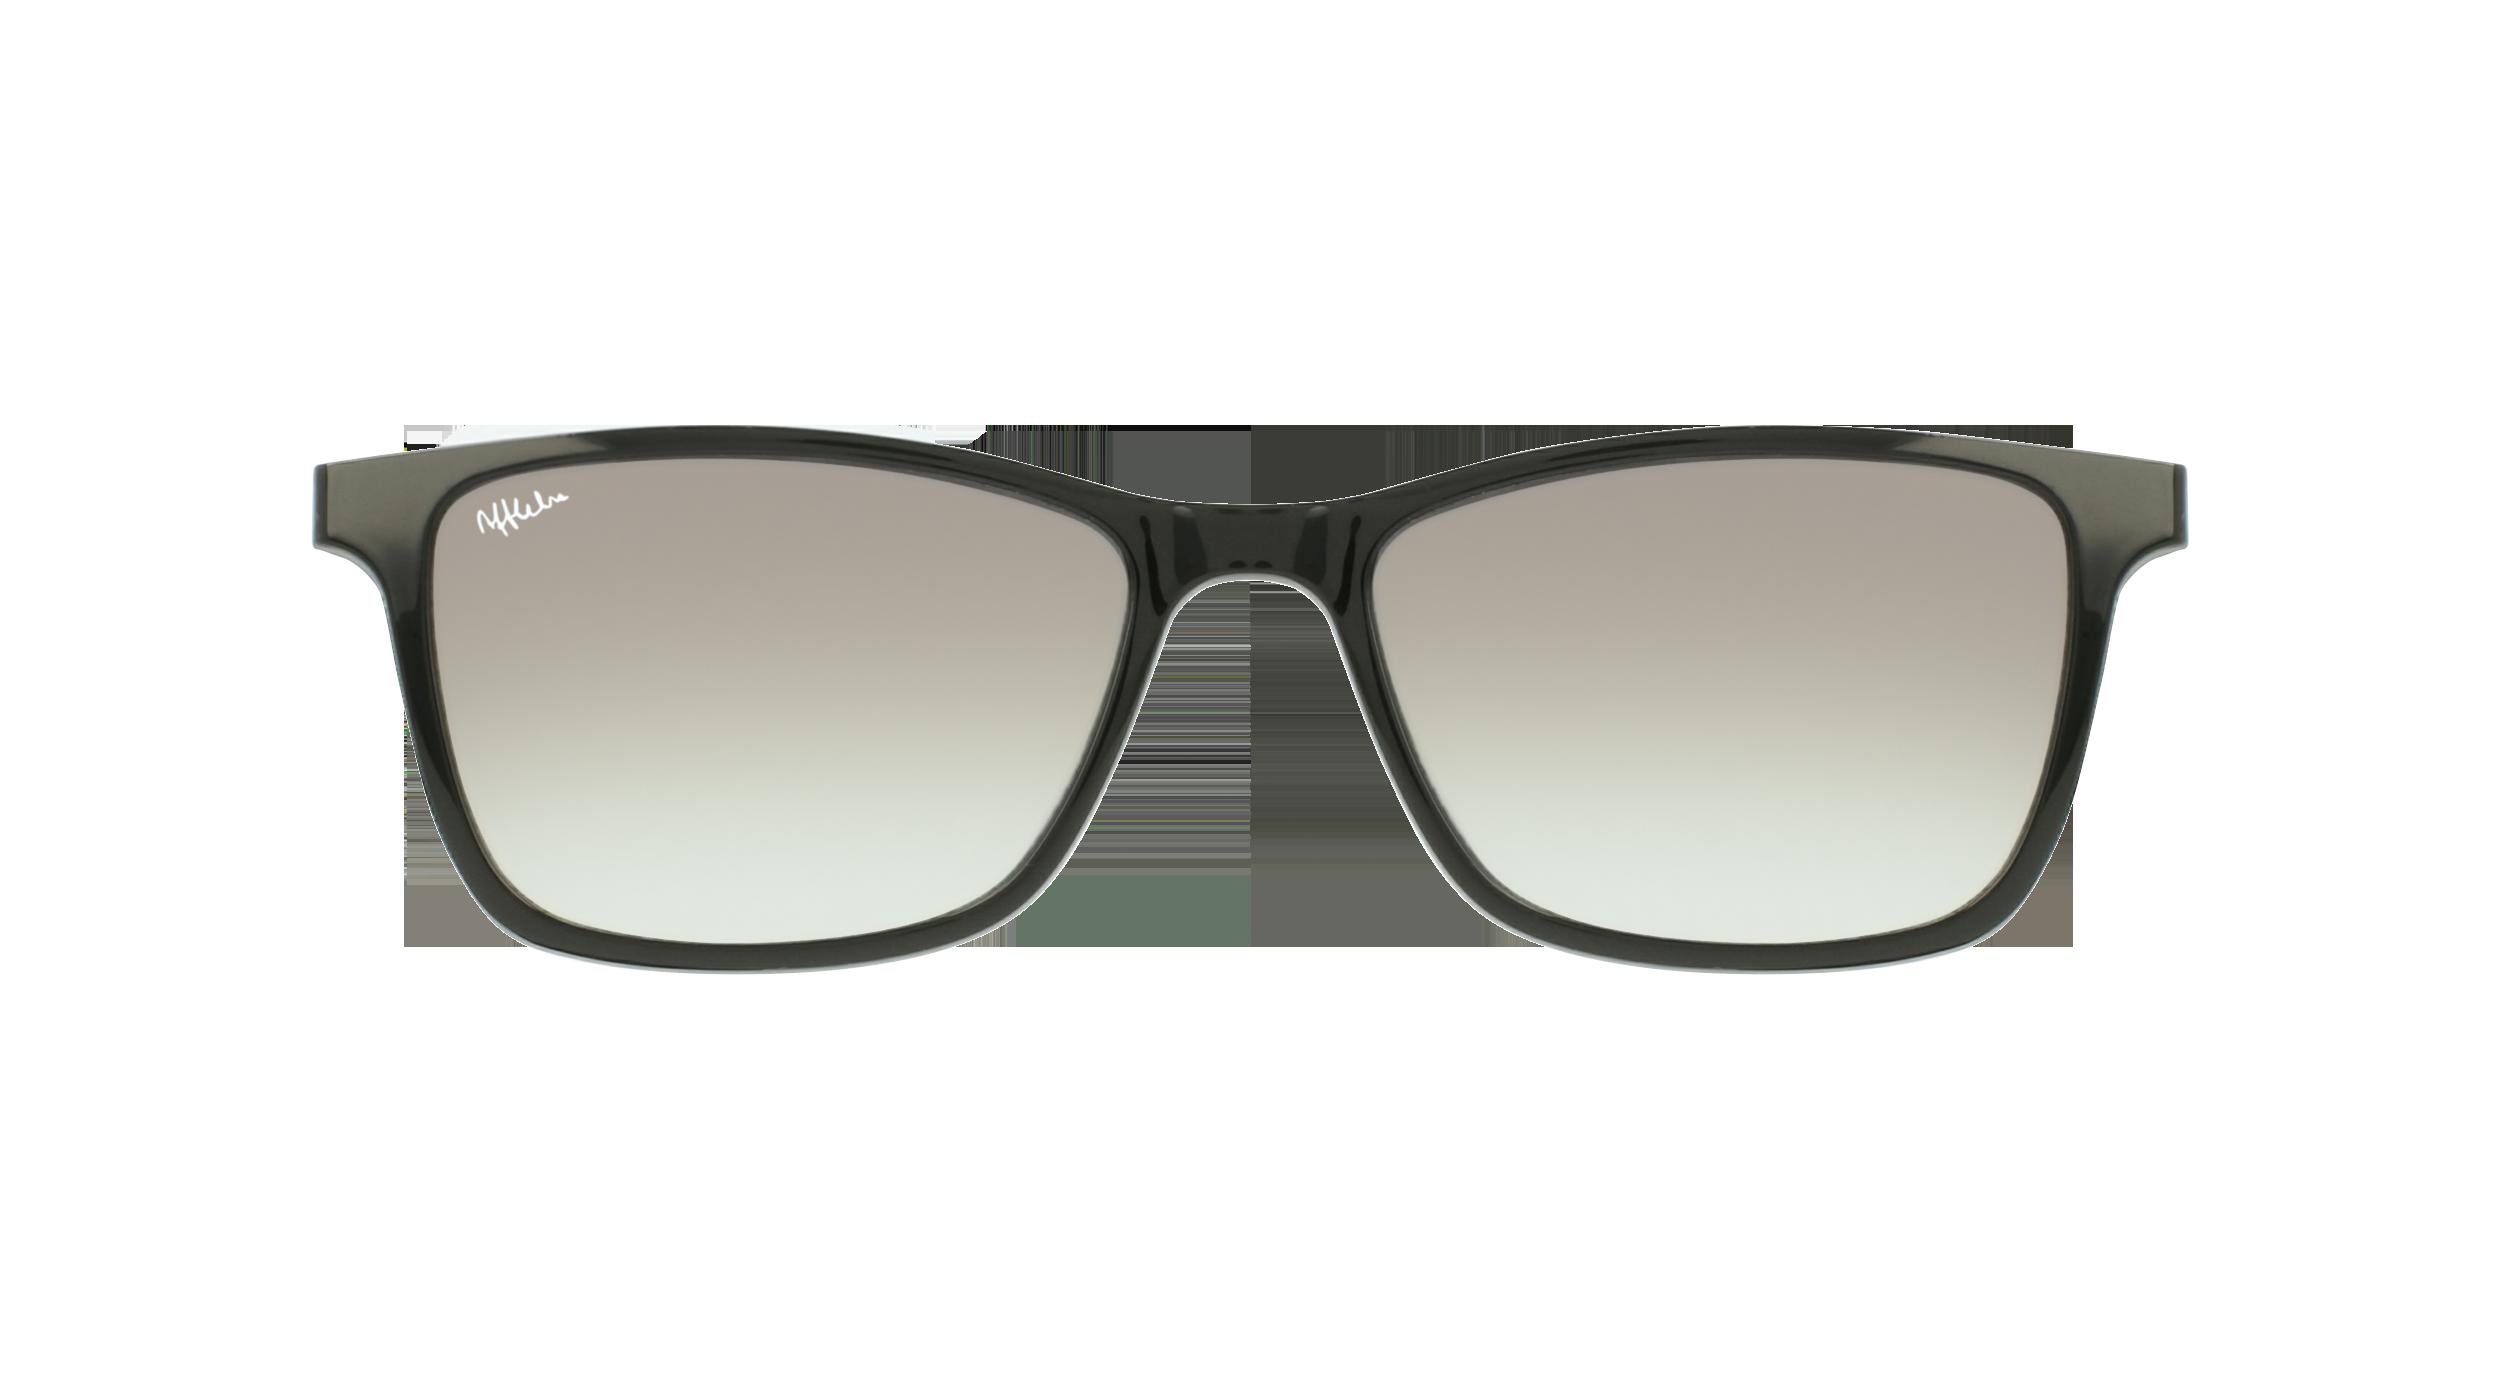 afflelou/france/products/smart_clip/clips_glasses/07630036457696.png